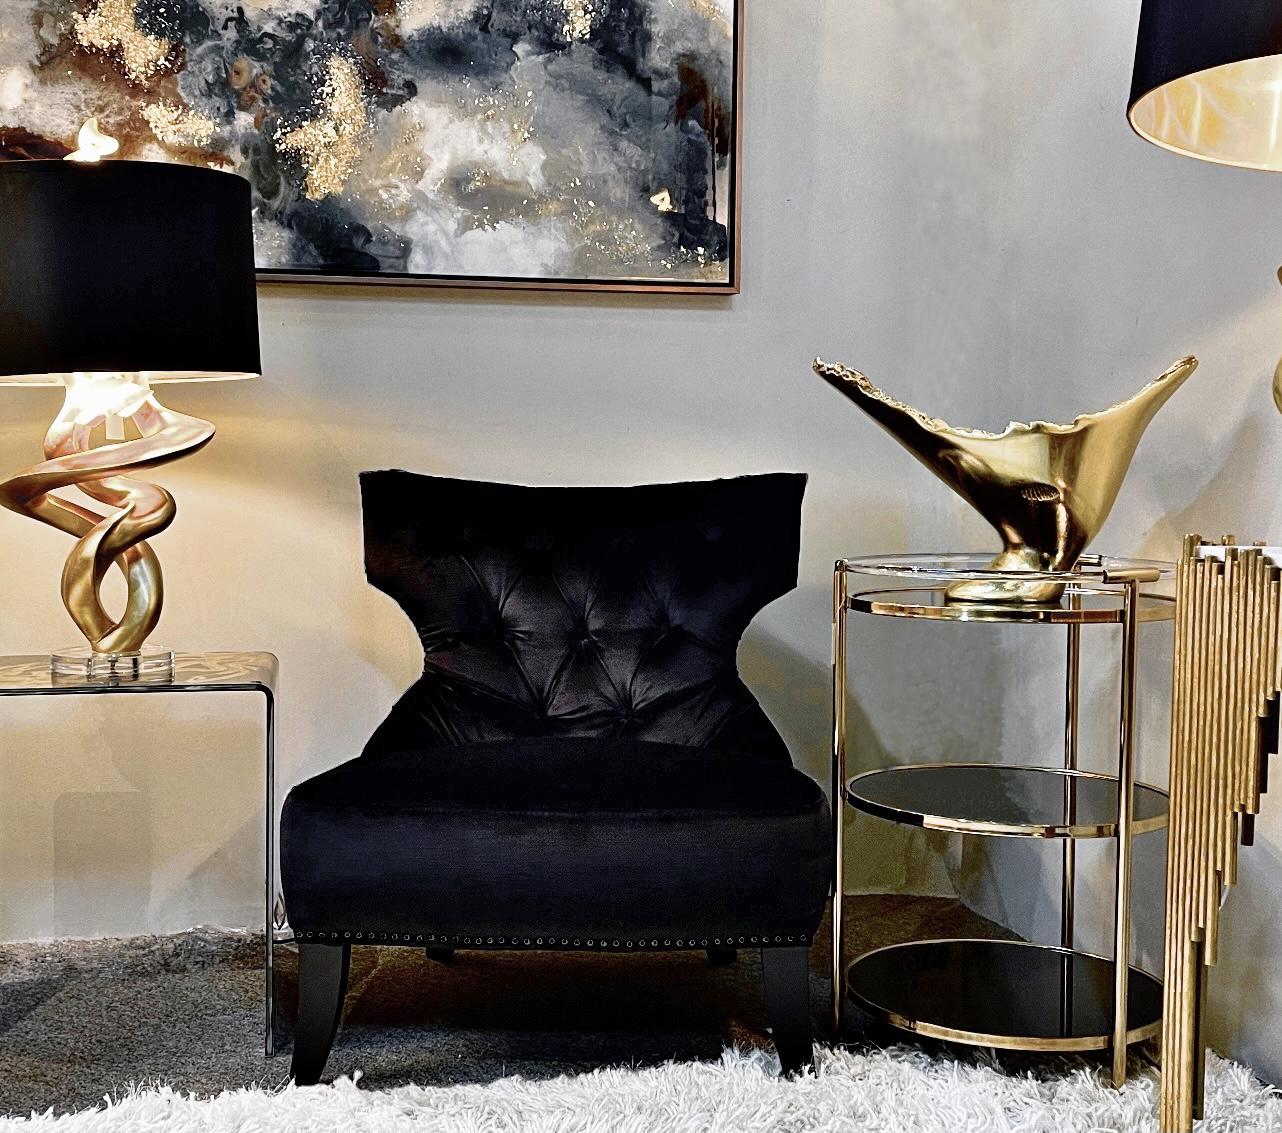 #chairs #chaise #cool #decoracion #decoration #decoração #design #desk #divani. Divano Designs Fine Furniture And Accessories